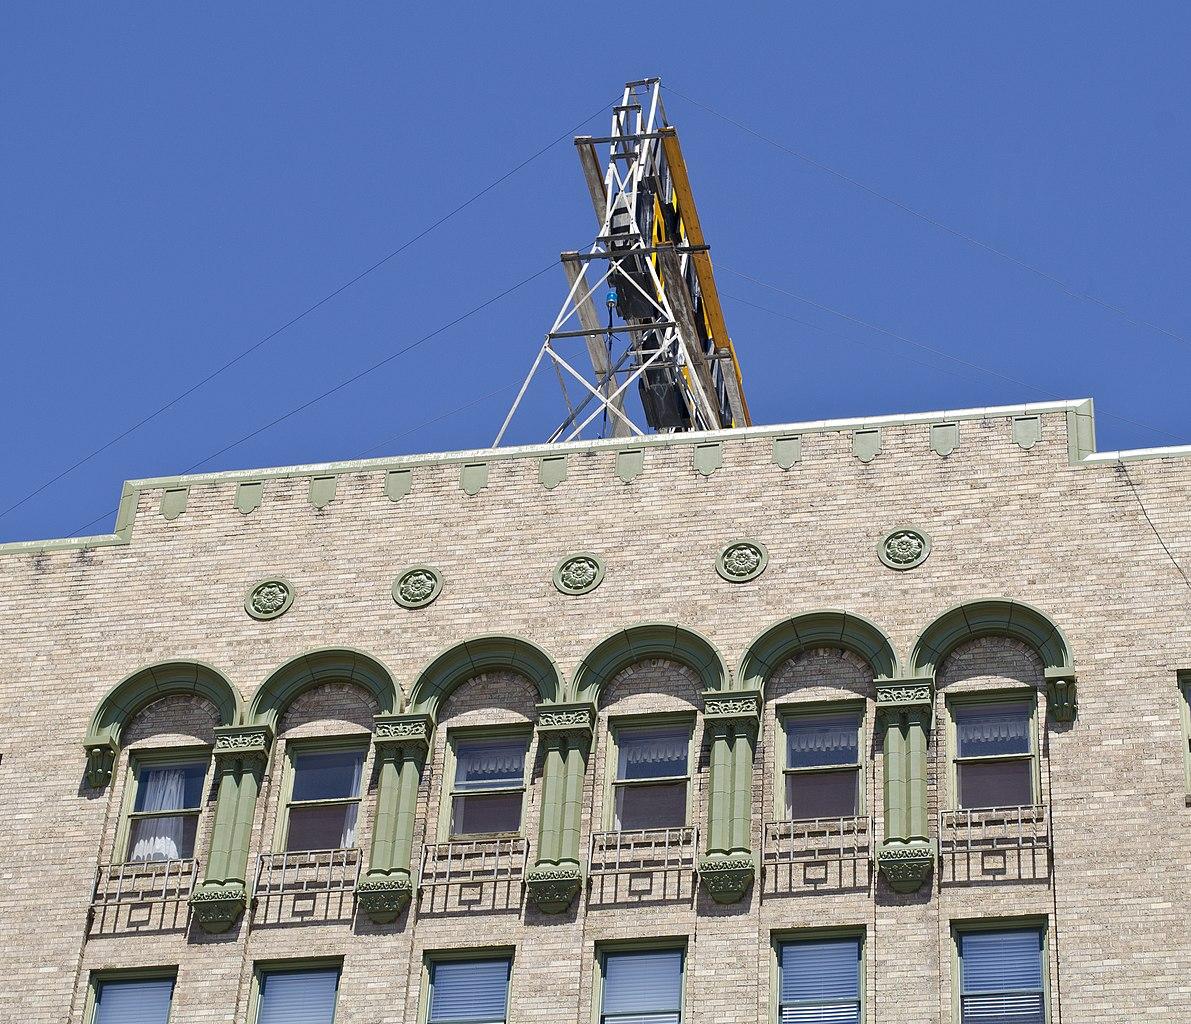 File:Upper Floor Facade Molding And Cornice